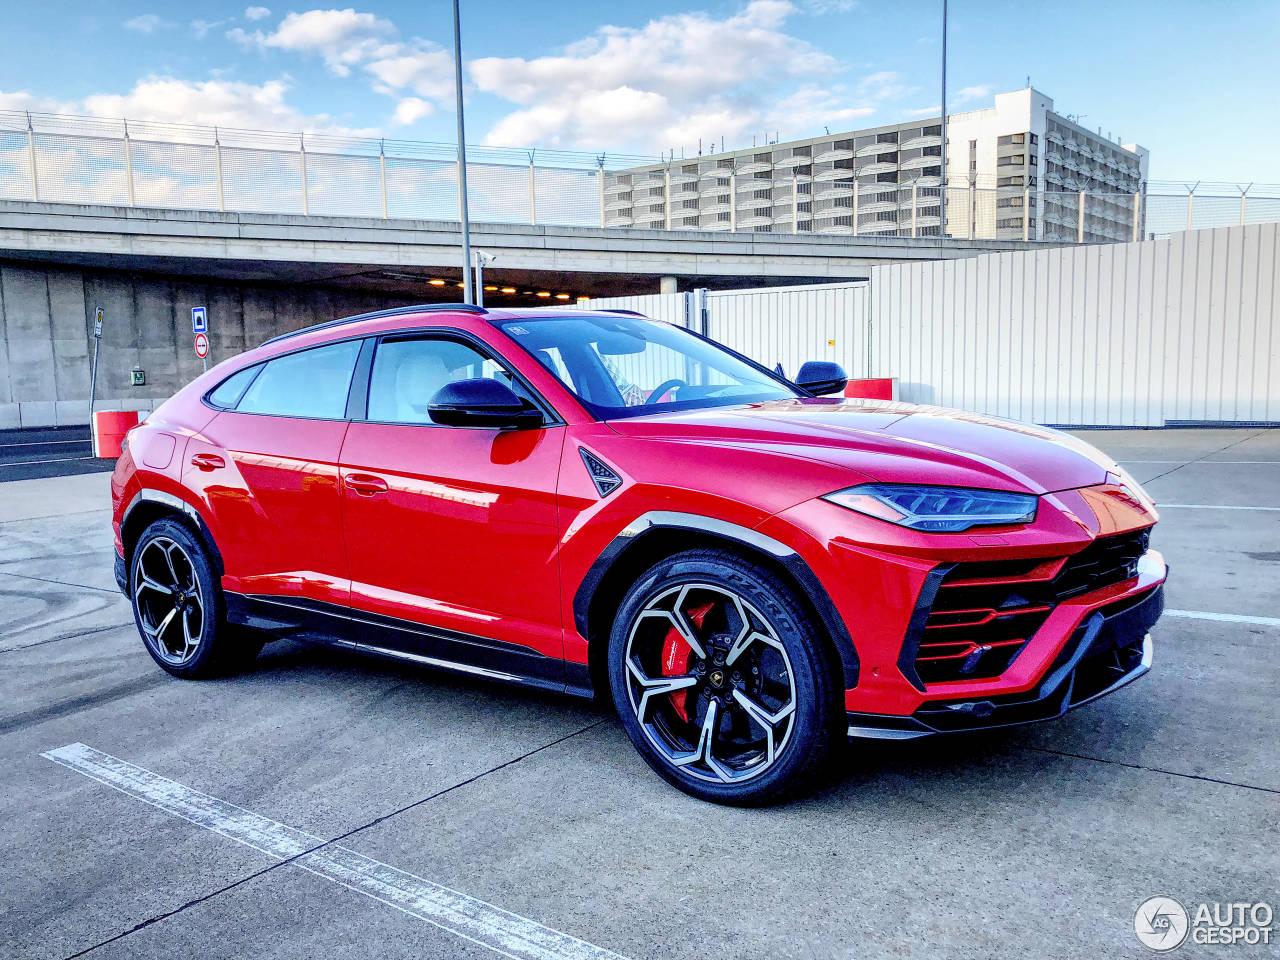 Rosso Mars Lamborghini Urus Looks like a Plus-Sized ...